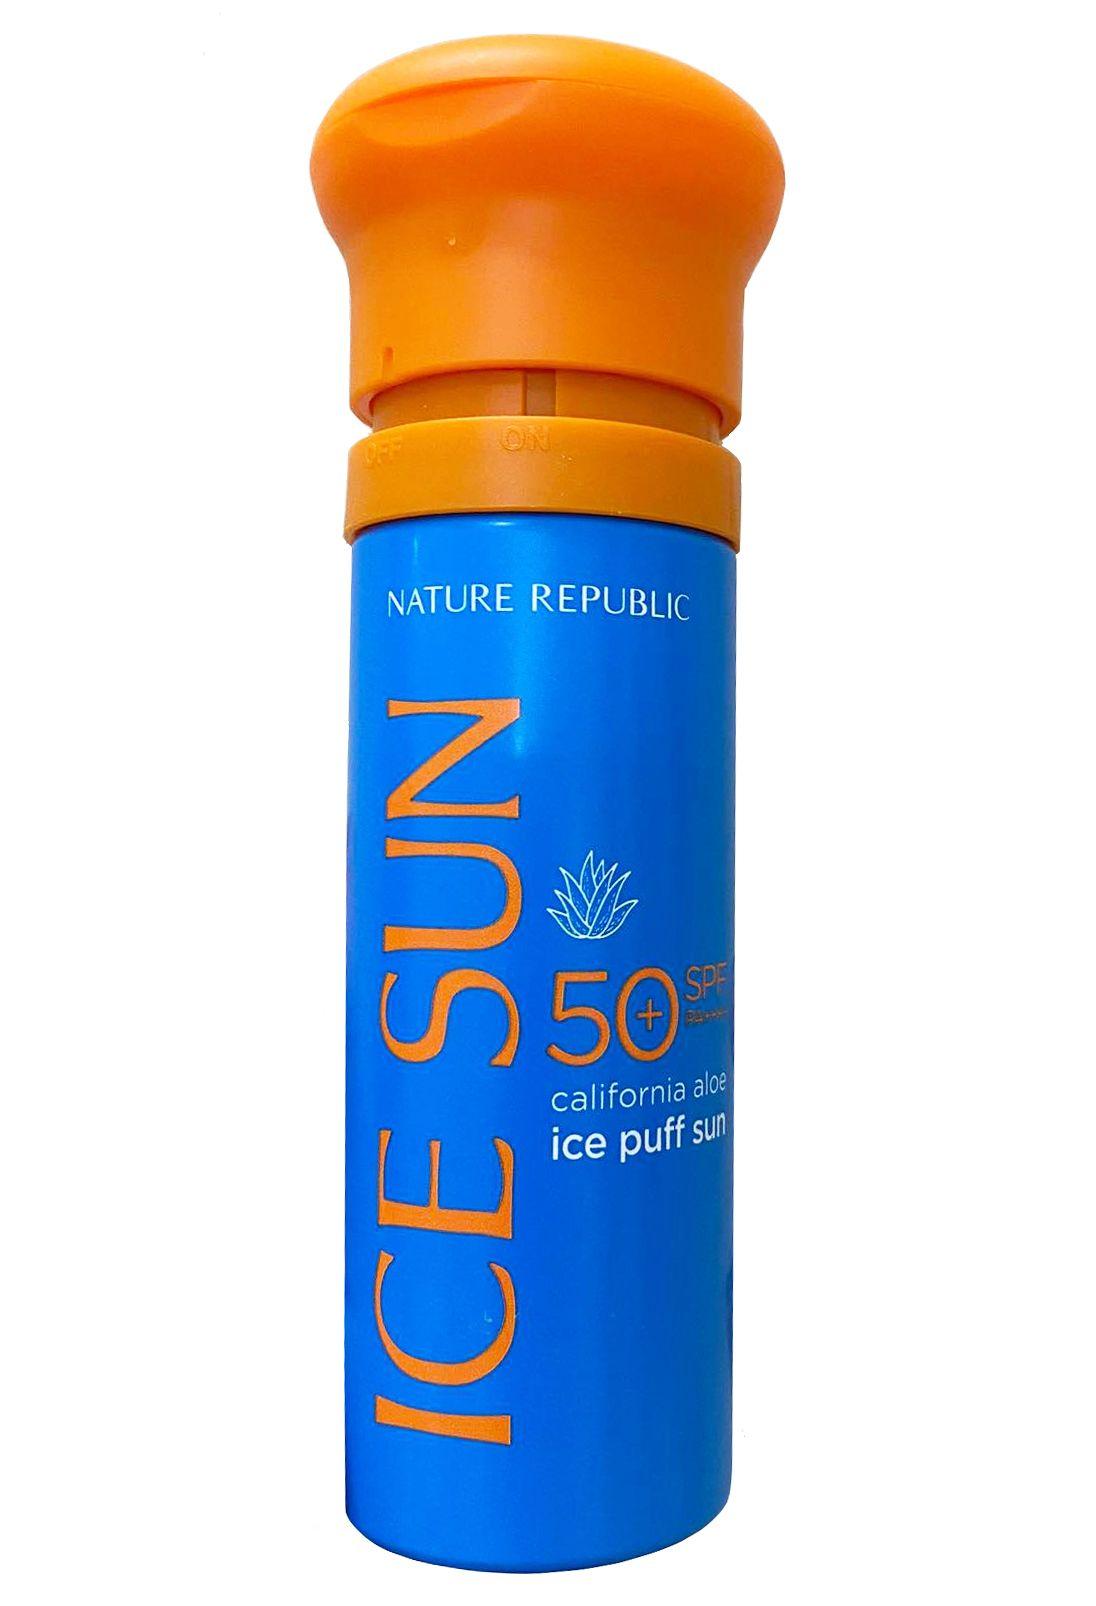 Kem chống nắng Nature Republic Ice Sun SPF50 (mẫu 2020)